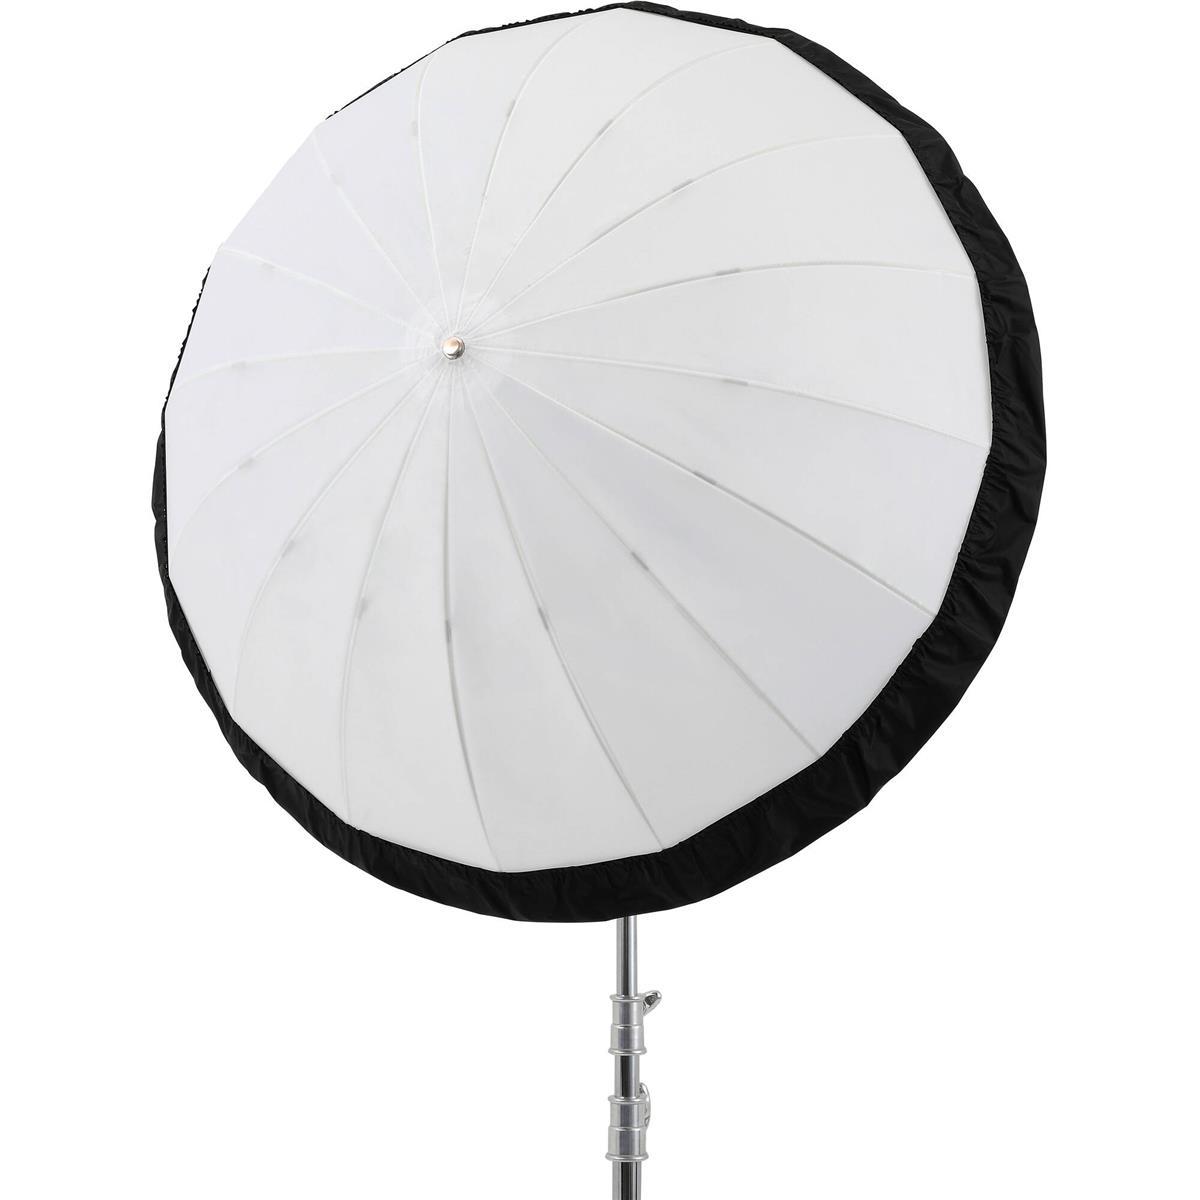 Godox 105 cm Schwarz / Silber Diffusor für Parabolschirm UB-105D